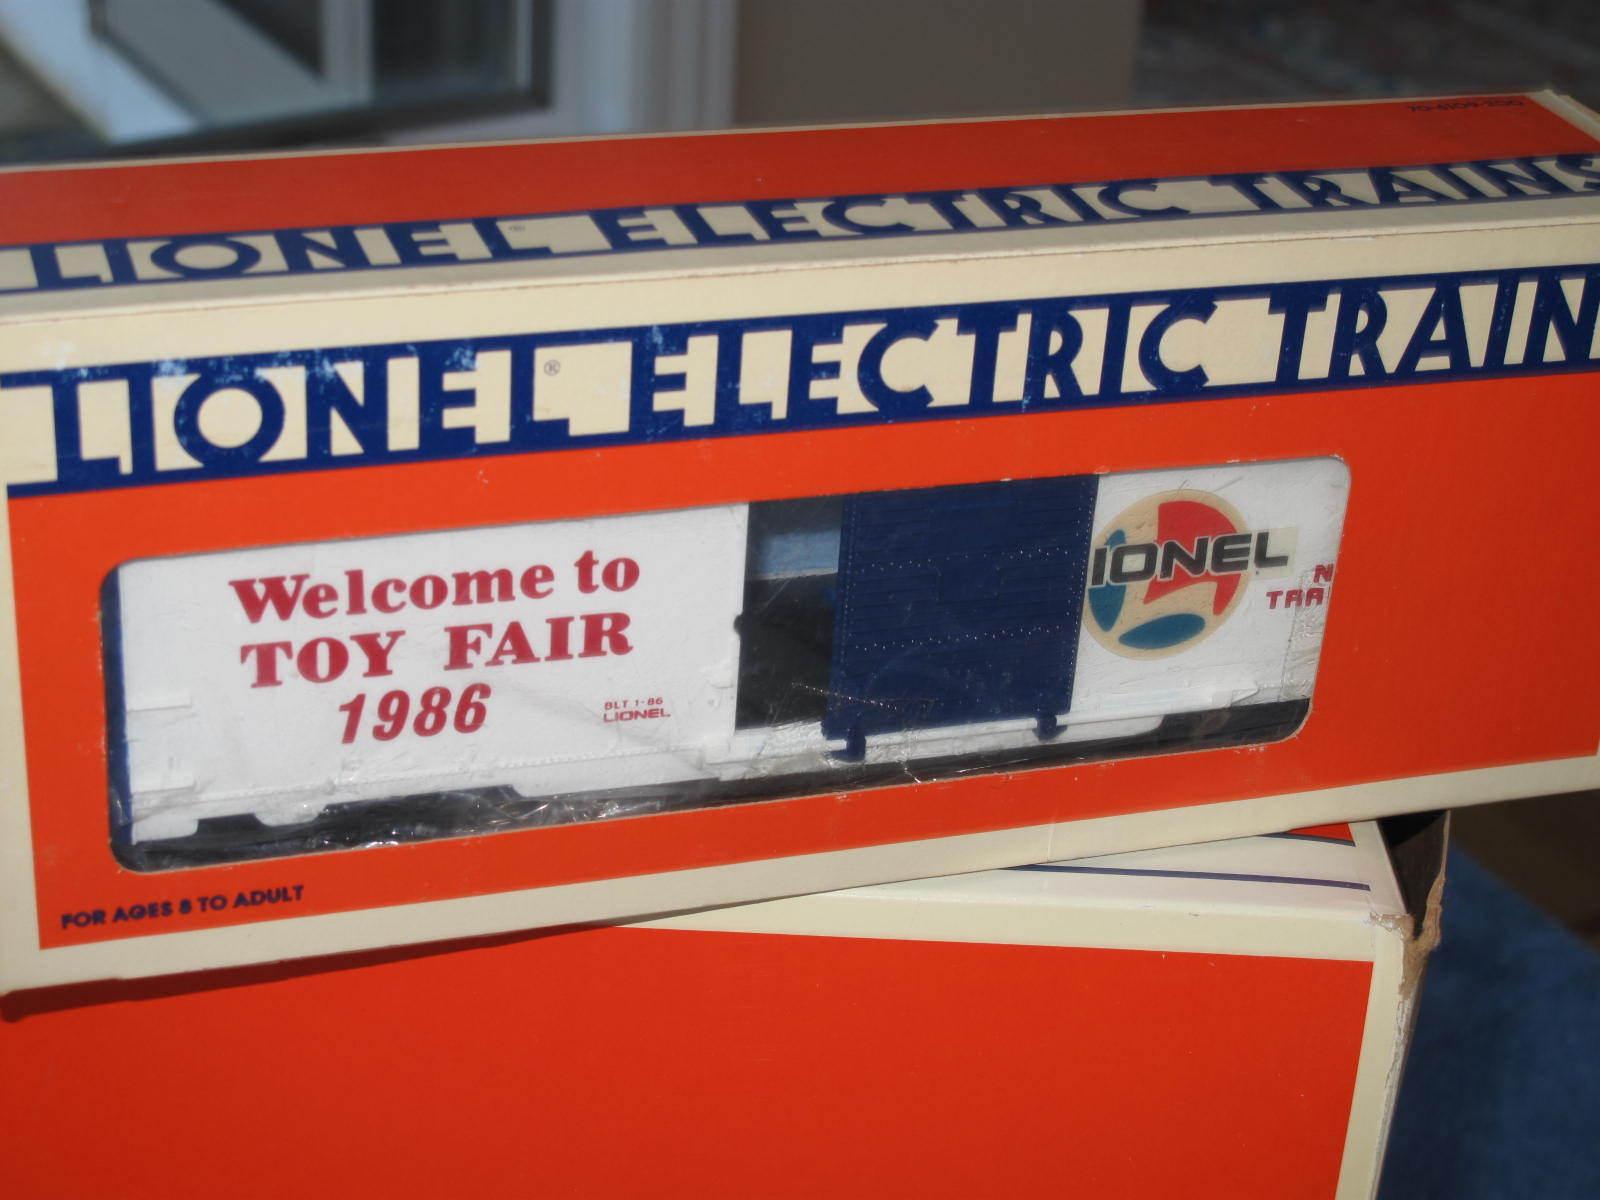 1986 Lionel 6-7525 Toy Fair Box Car L0953